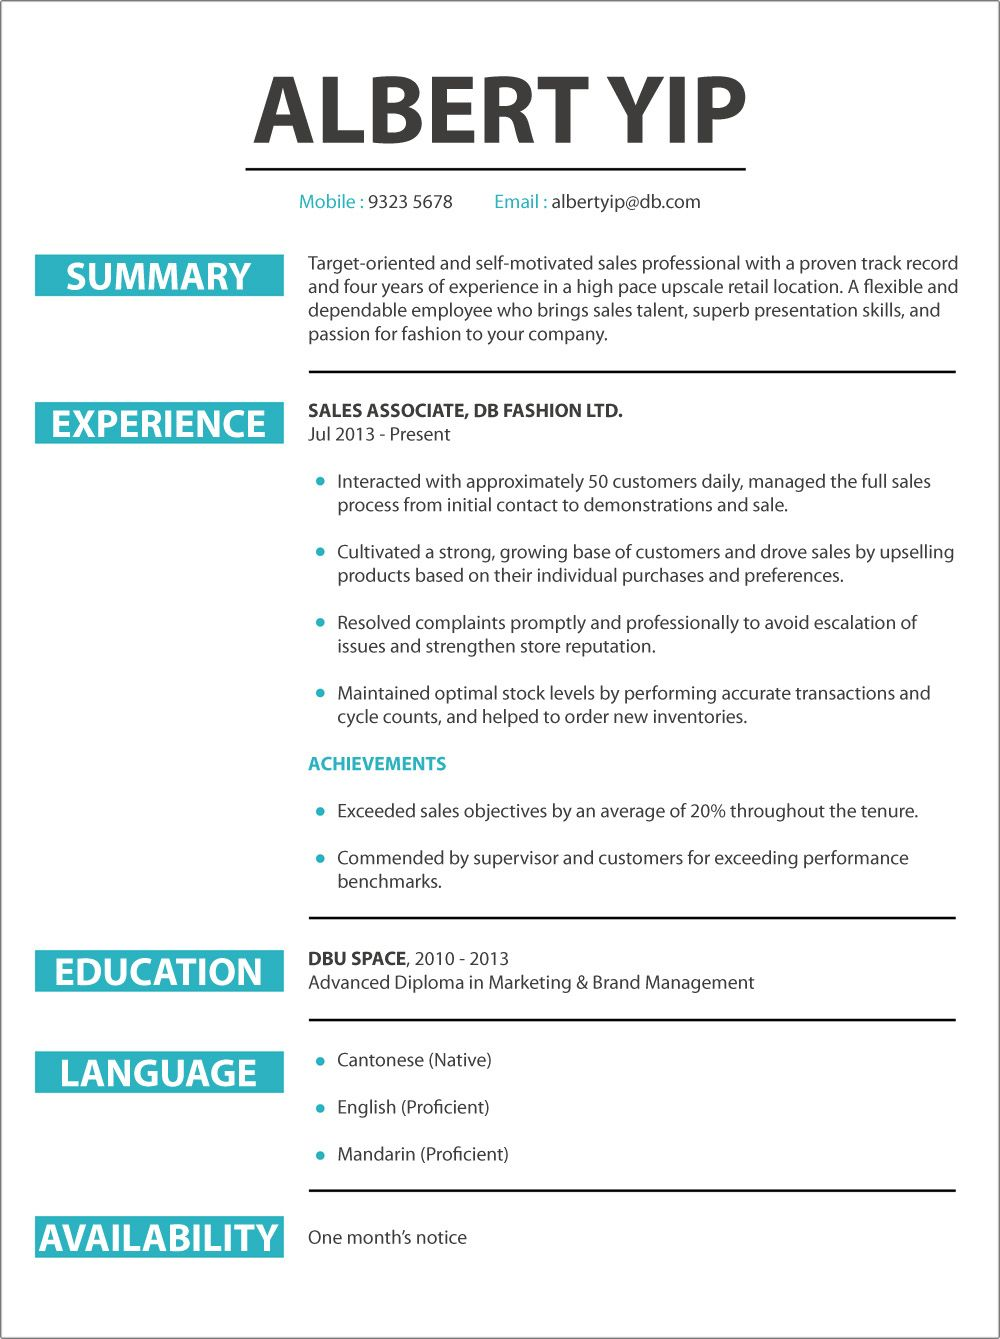 Cv Sample Jobsdb Resume Format Resume Templates Resume Resume Examples